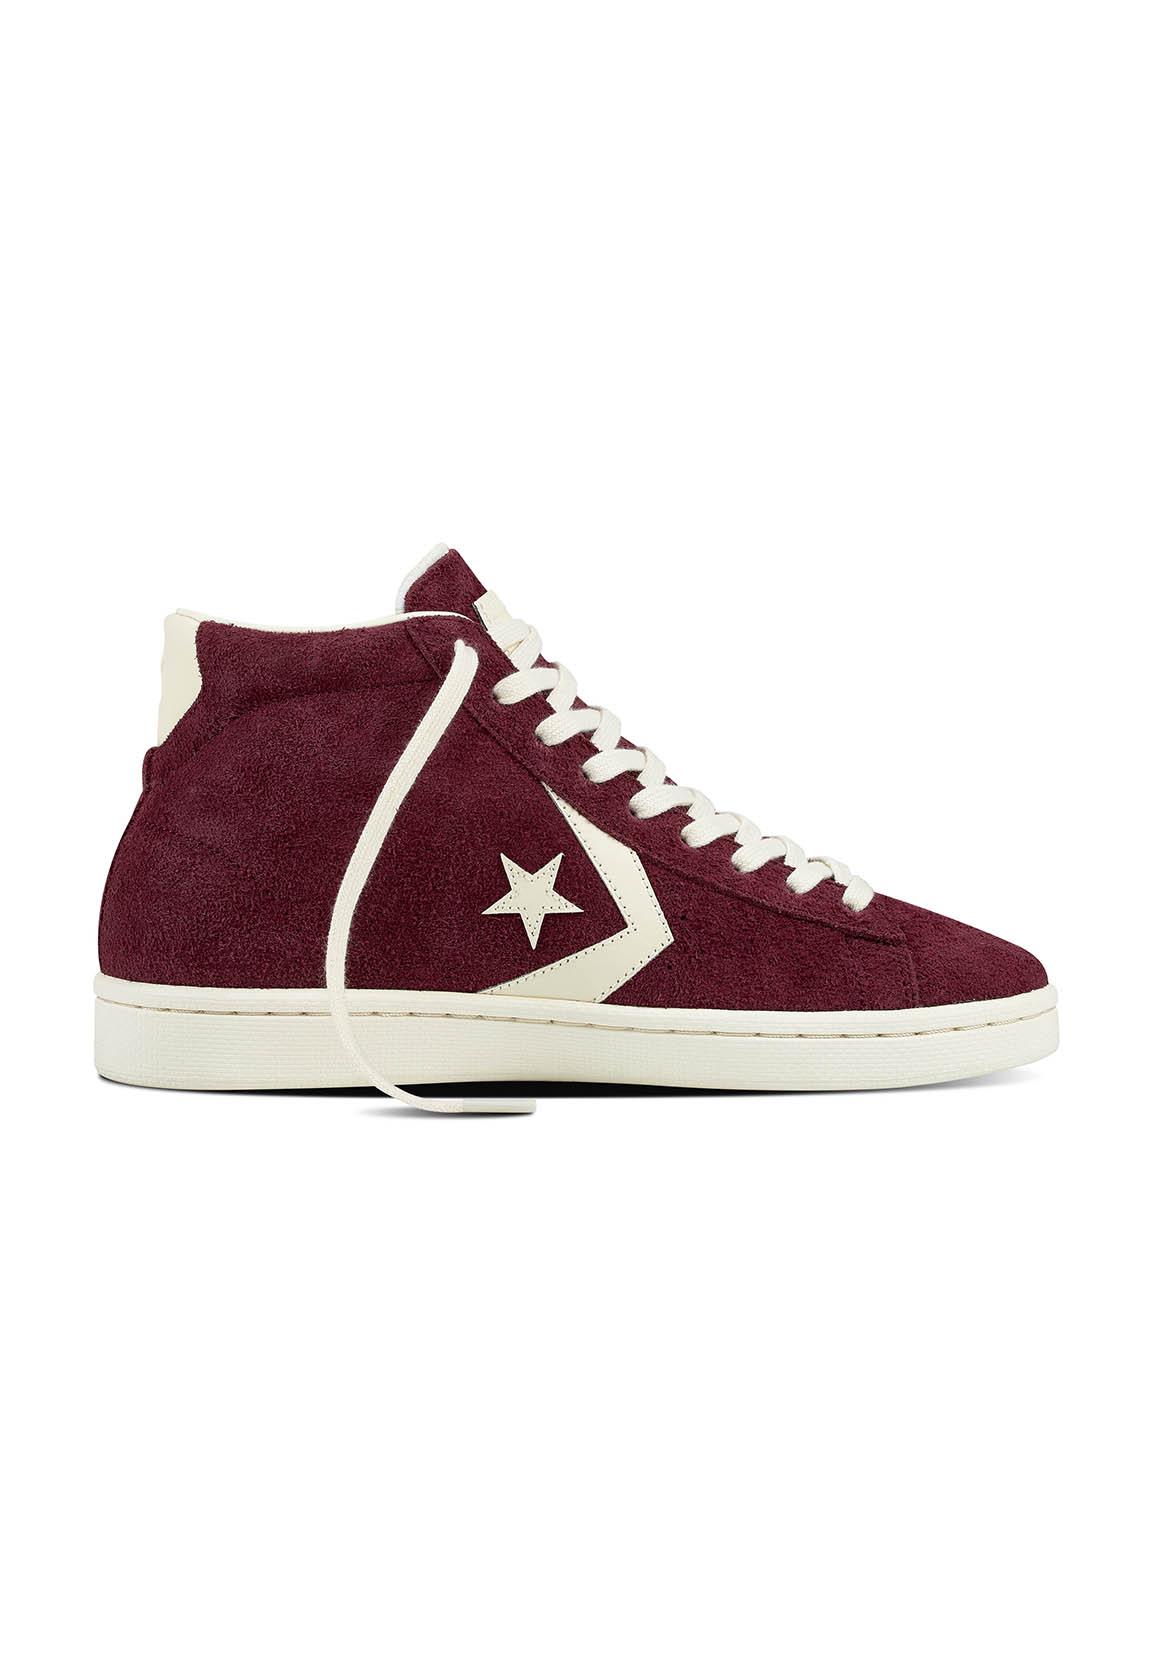 0df73941740013 ... low price converse chucks high pro leather mid 157691c lila dark  sangria 49da3 6b7fa